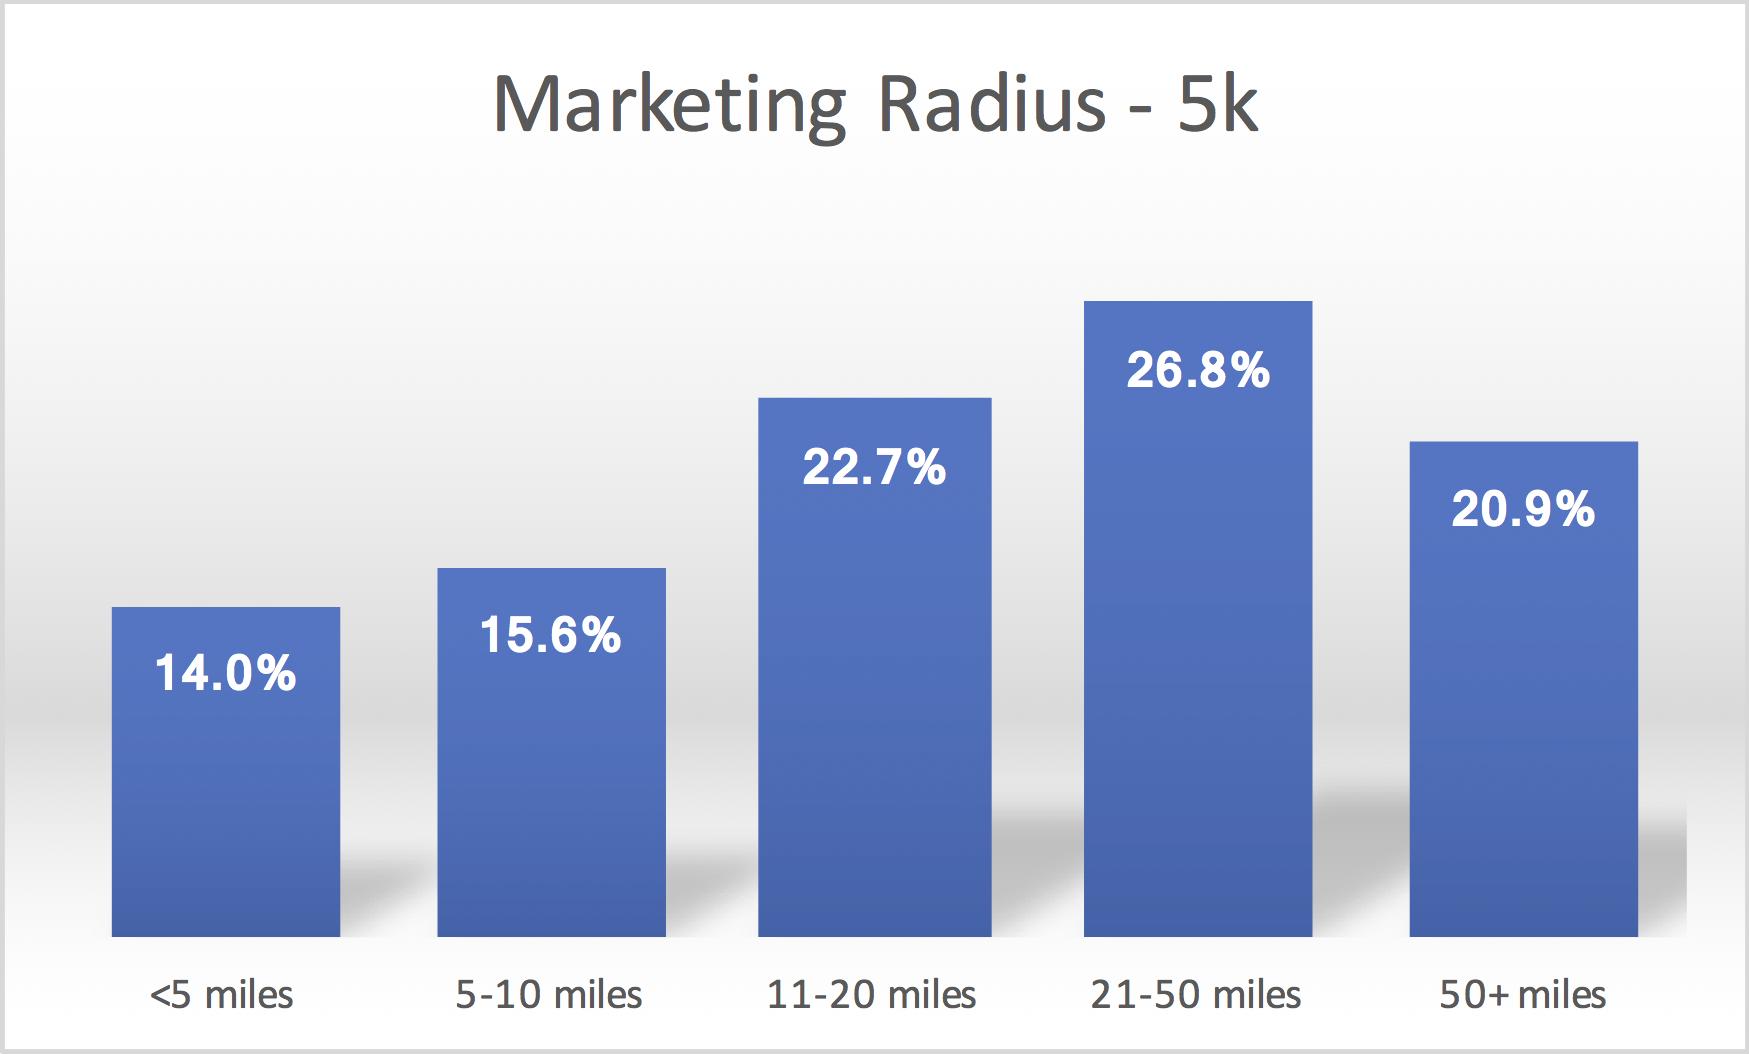 Marketing Radius - 5k